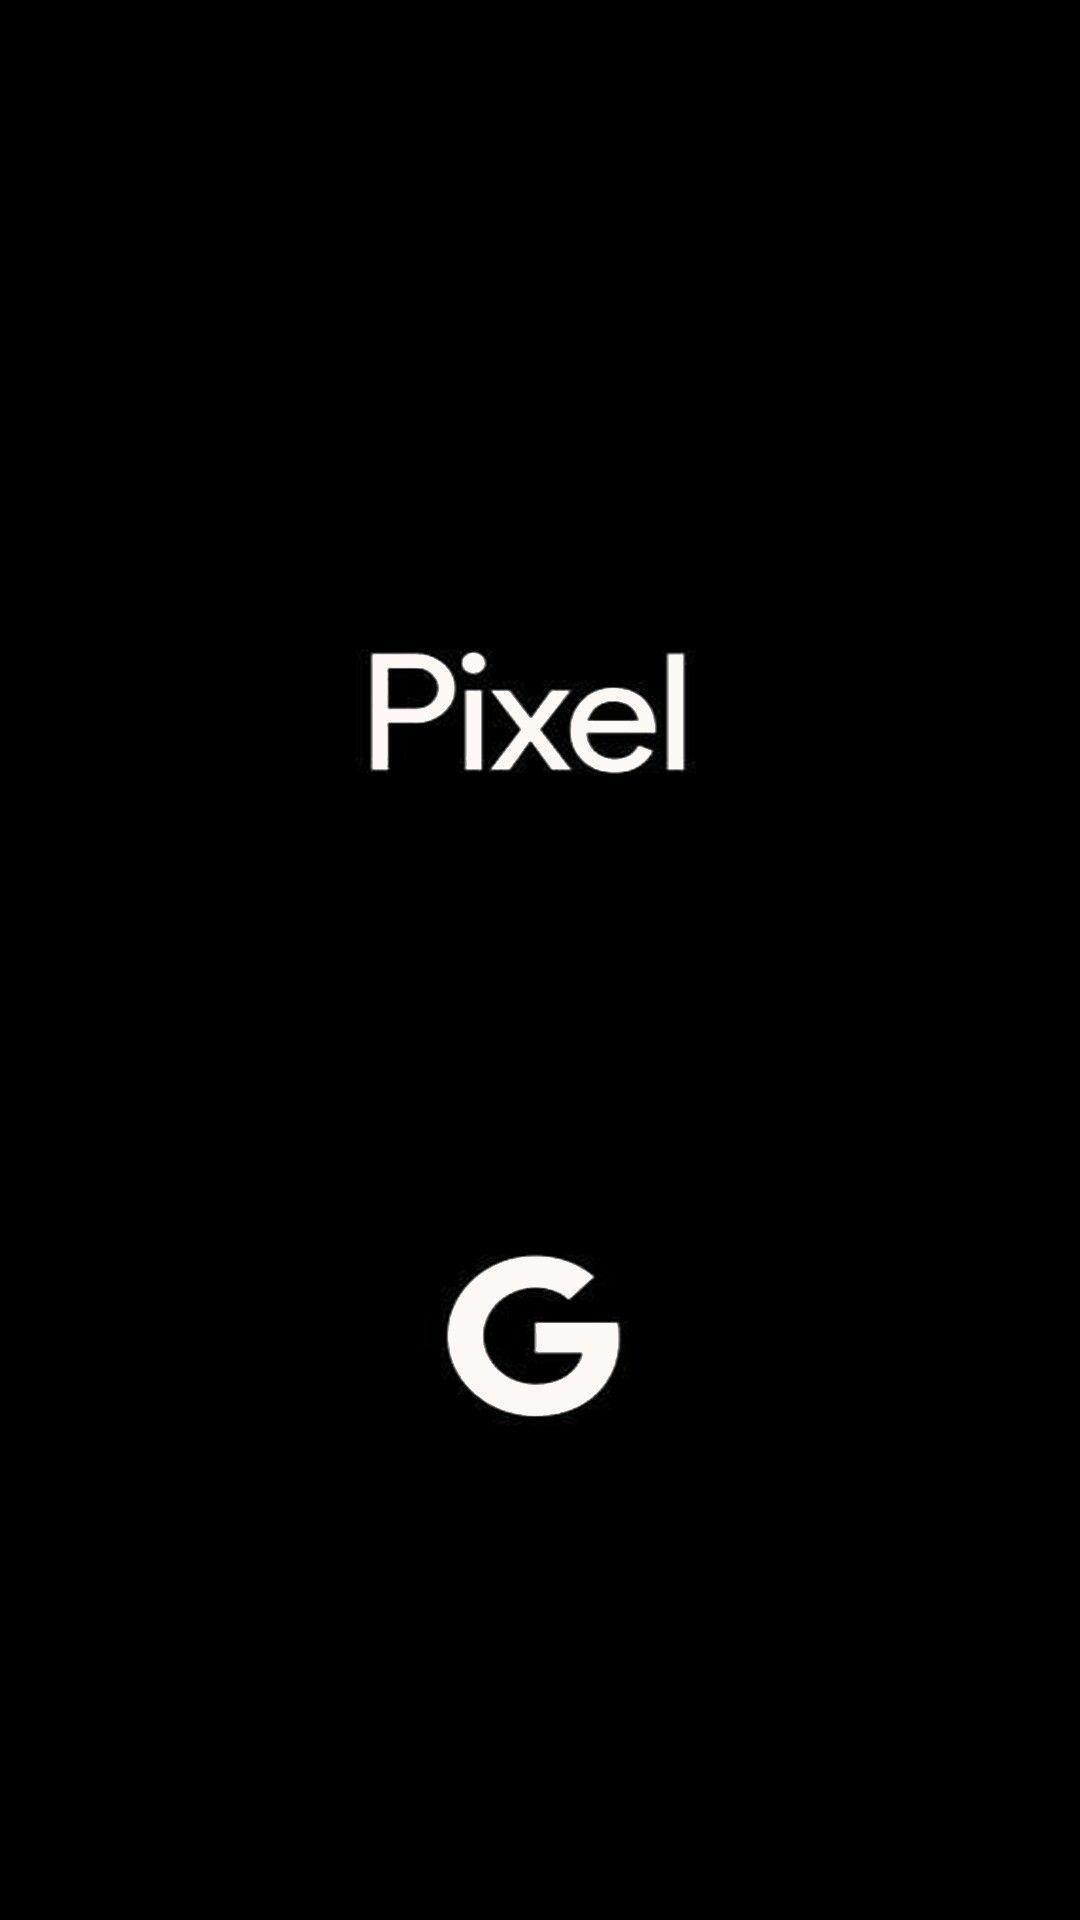 Logo Skyrim Is Best Wallpaper On Flowerswallpaper Info If You Like It Iphone Android Wallpaper Logo In 2020 Google Pixel Wallpaper Google Pixel Mobile Wallpaper